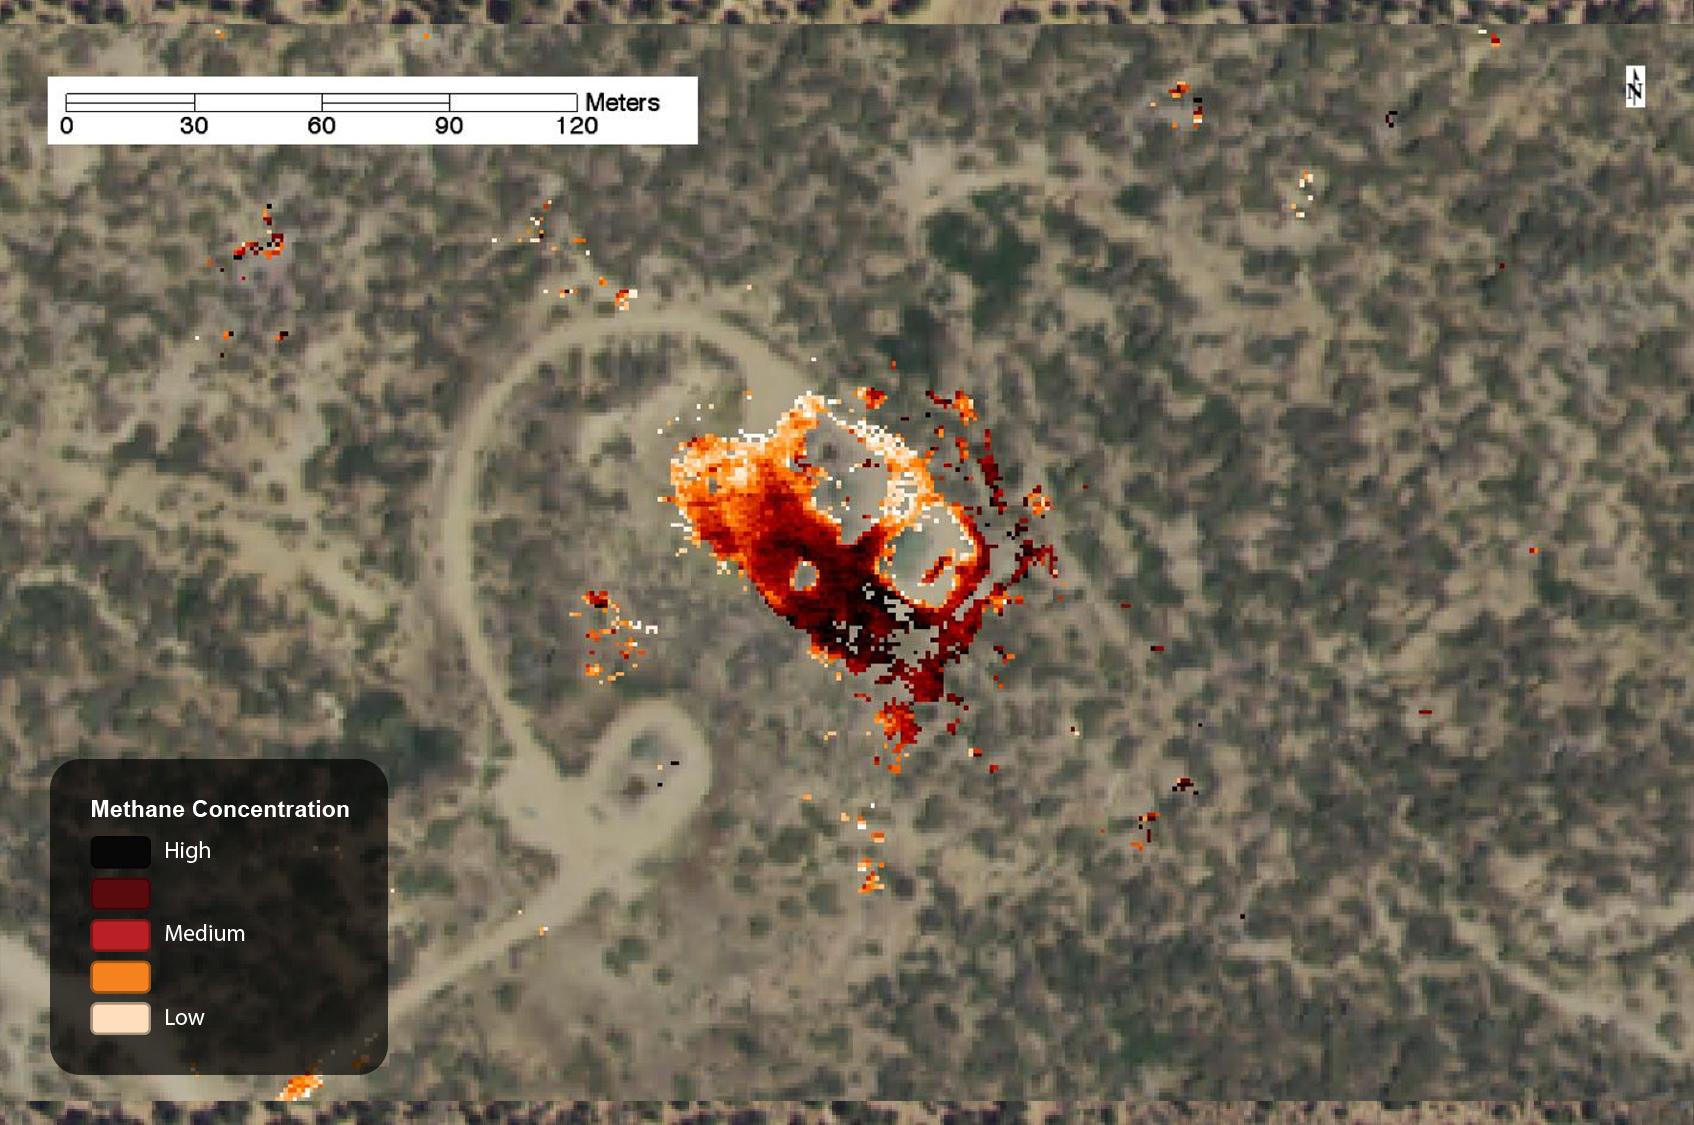 Methane leak on well pad, captured by AVIRISin 2015.